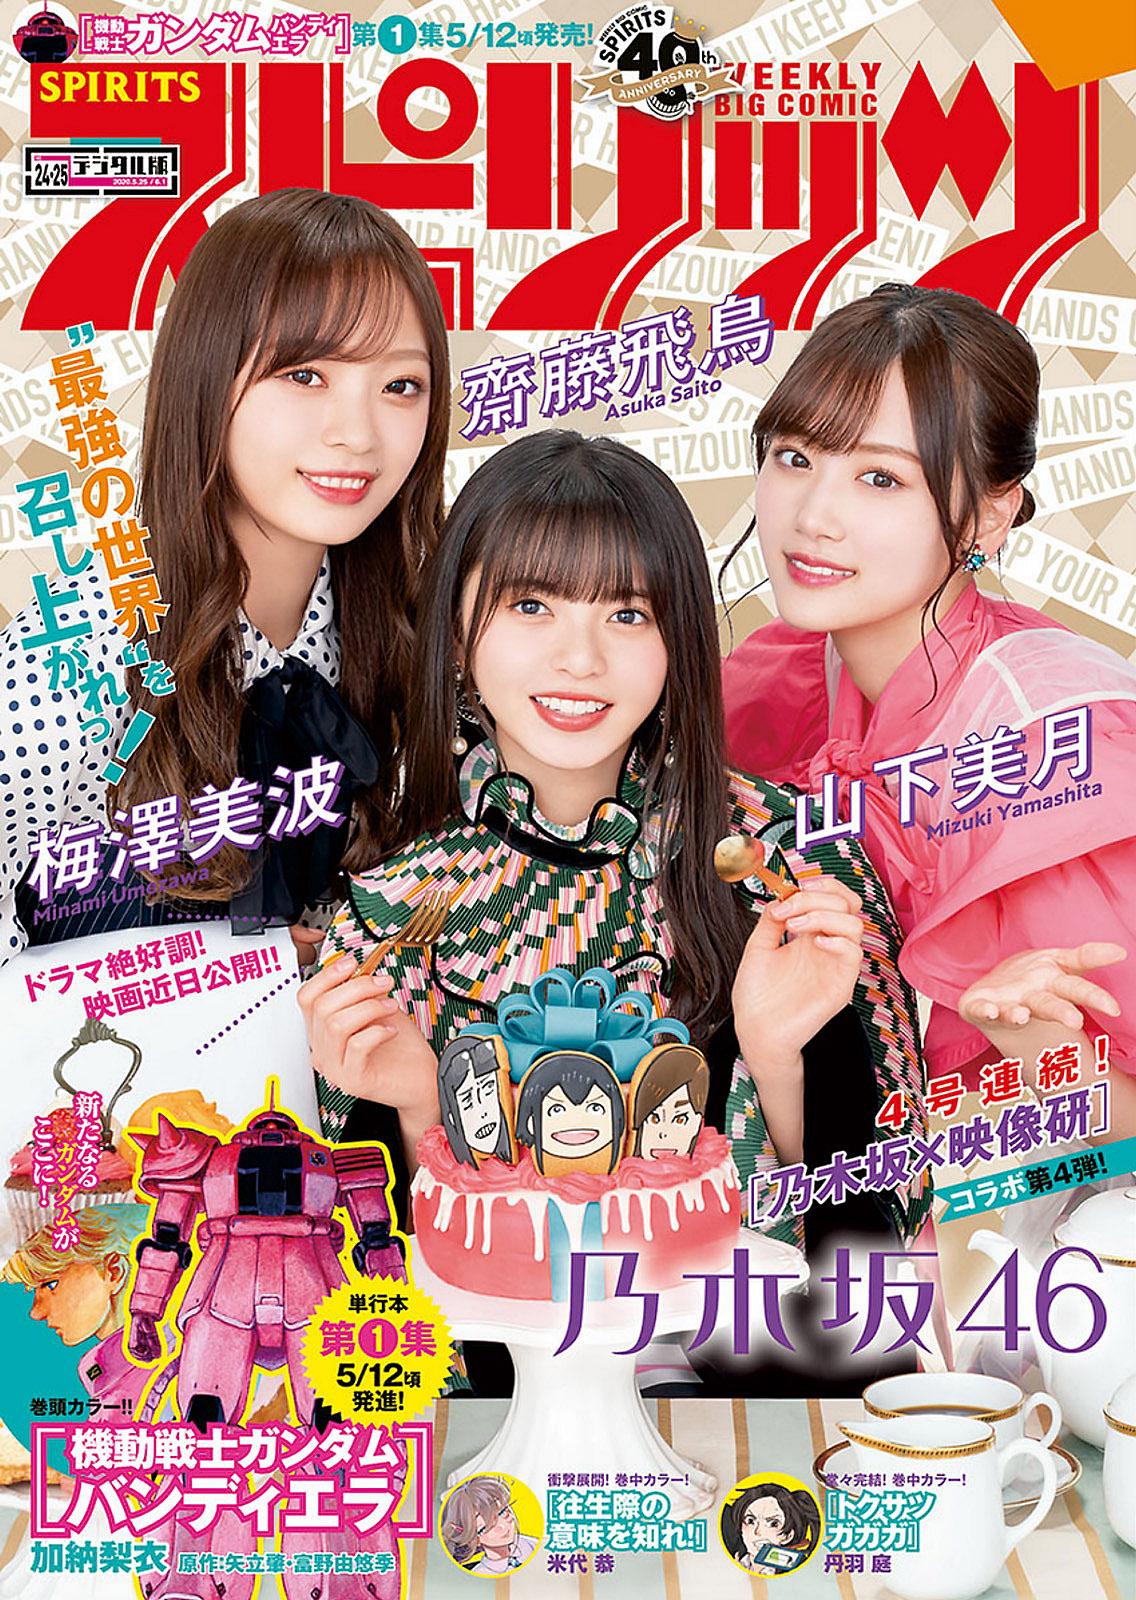 N46 Big Comic Spirits 200525 01.jpg